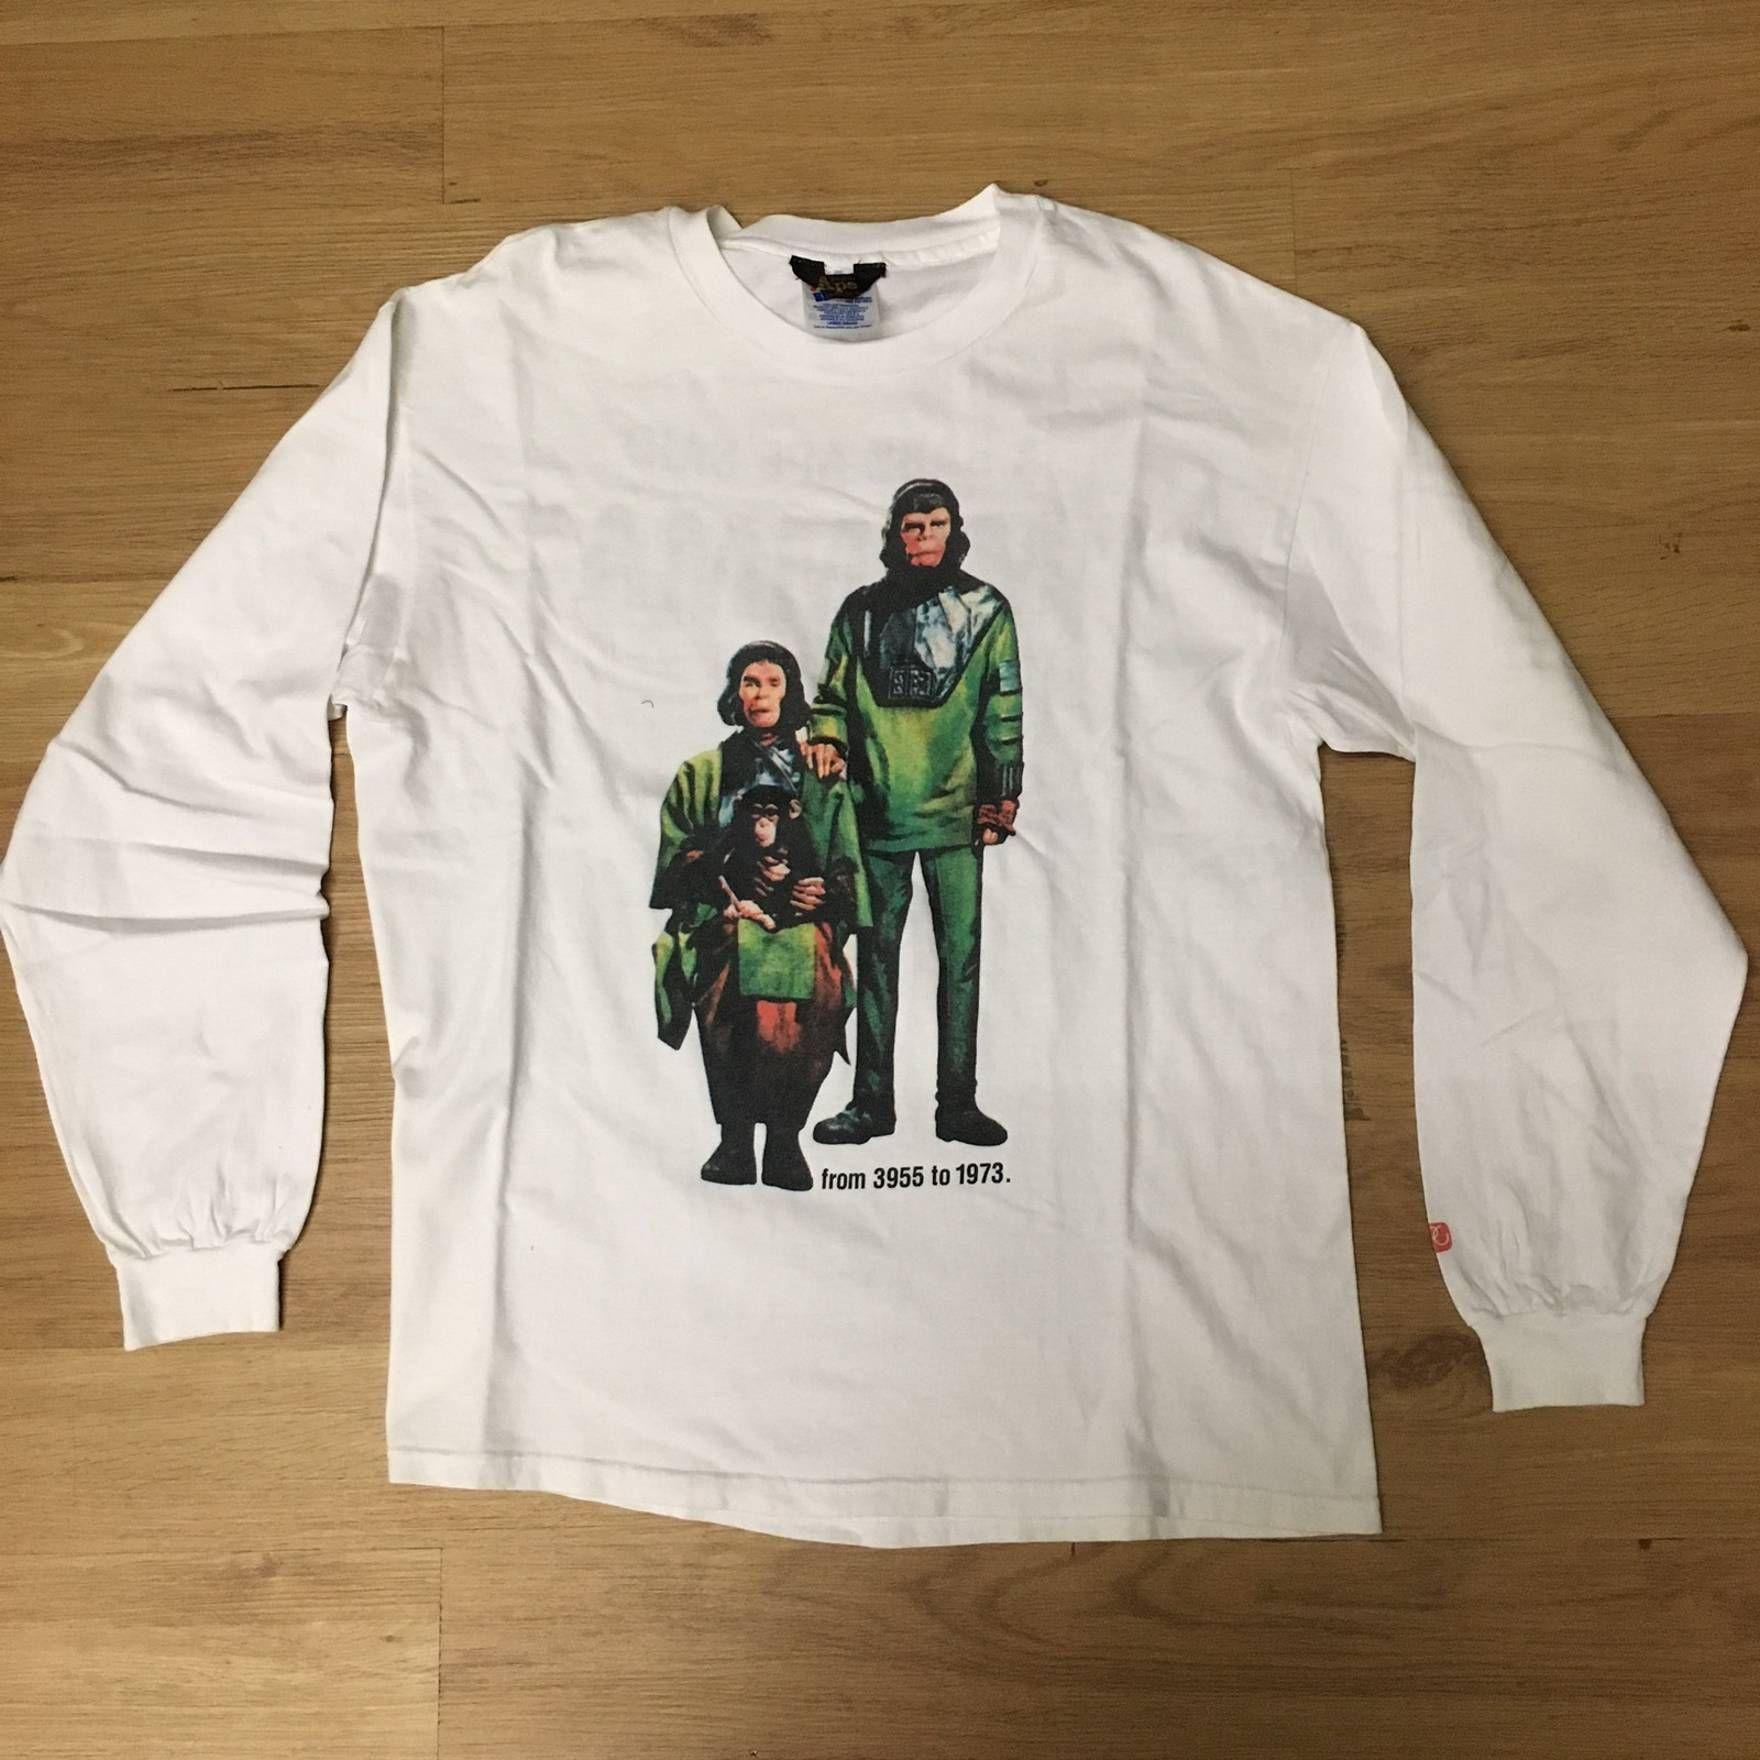 8e69d3bc83c Bape Vintage Bape T-Shirt Long Sleeve 90s Hanes Tag OG Head Shark First  Camo Size US L   EU 52-54   3